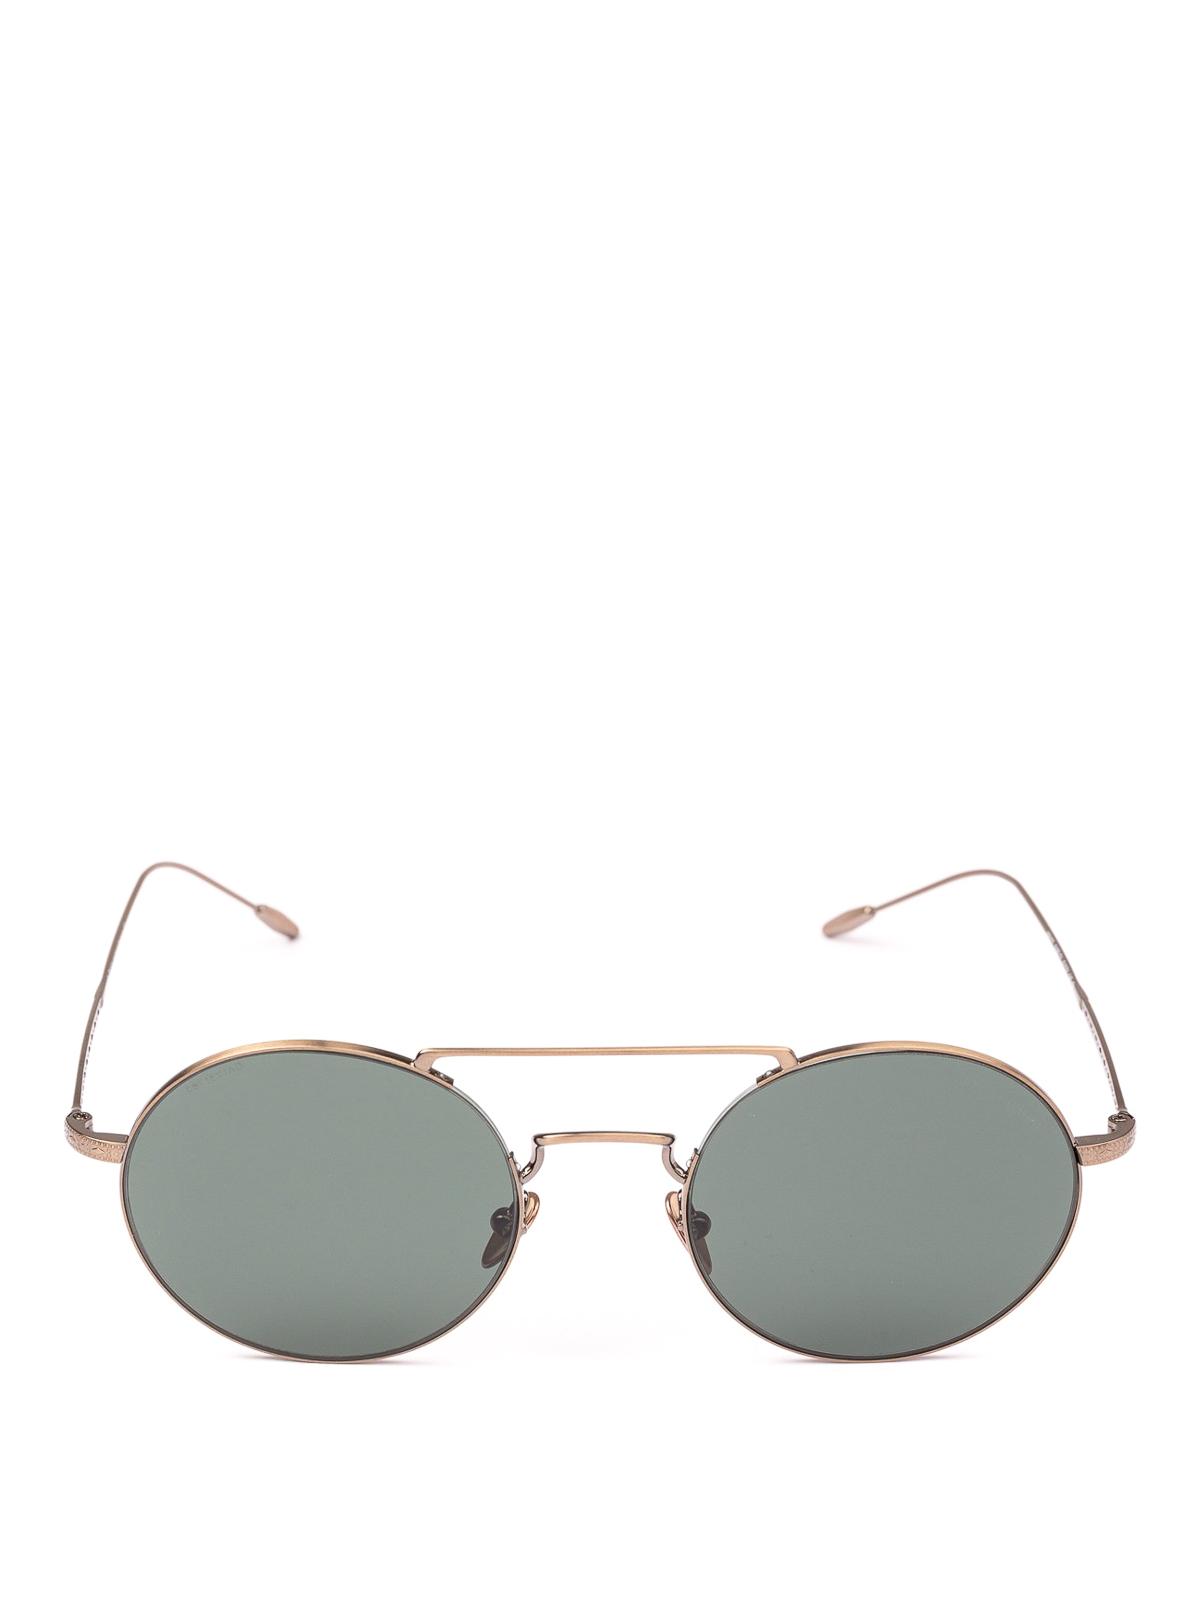 e6be42812a19 GIORGIO ARMANI  sunglasses online - Rose gold metal round sunglasses